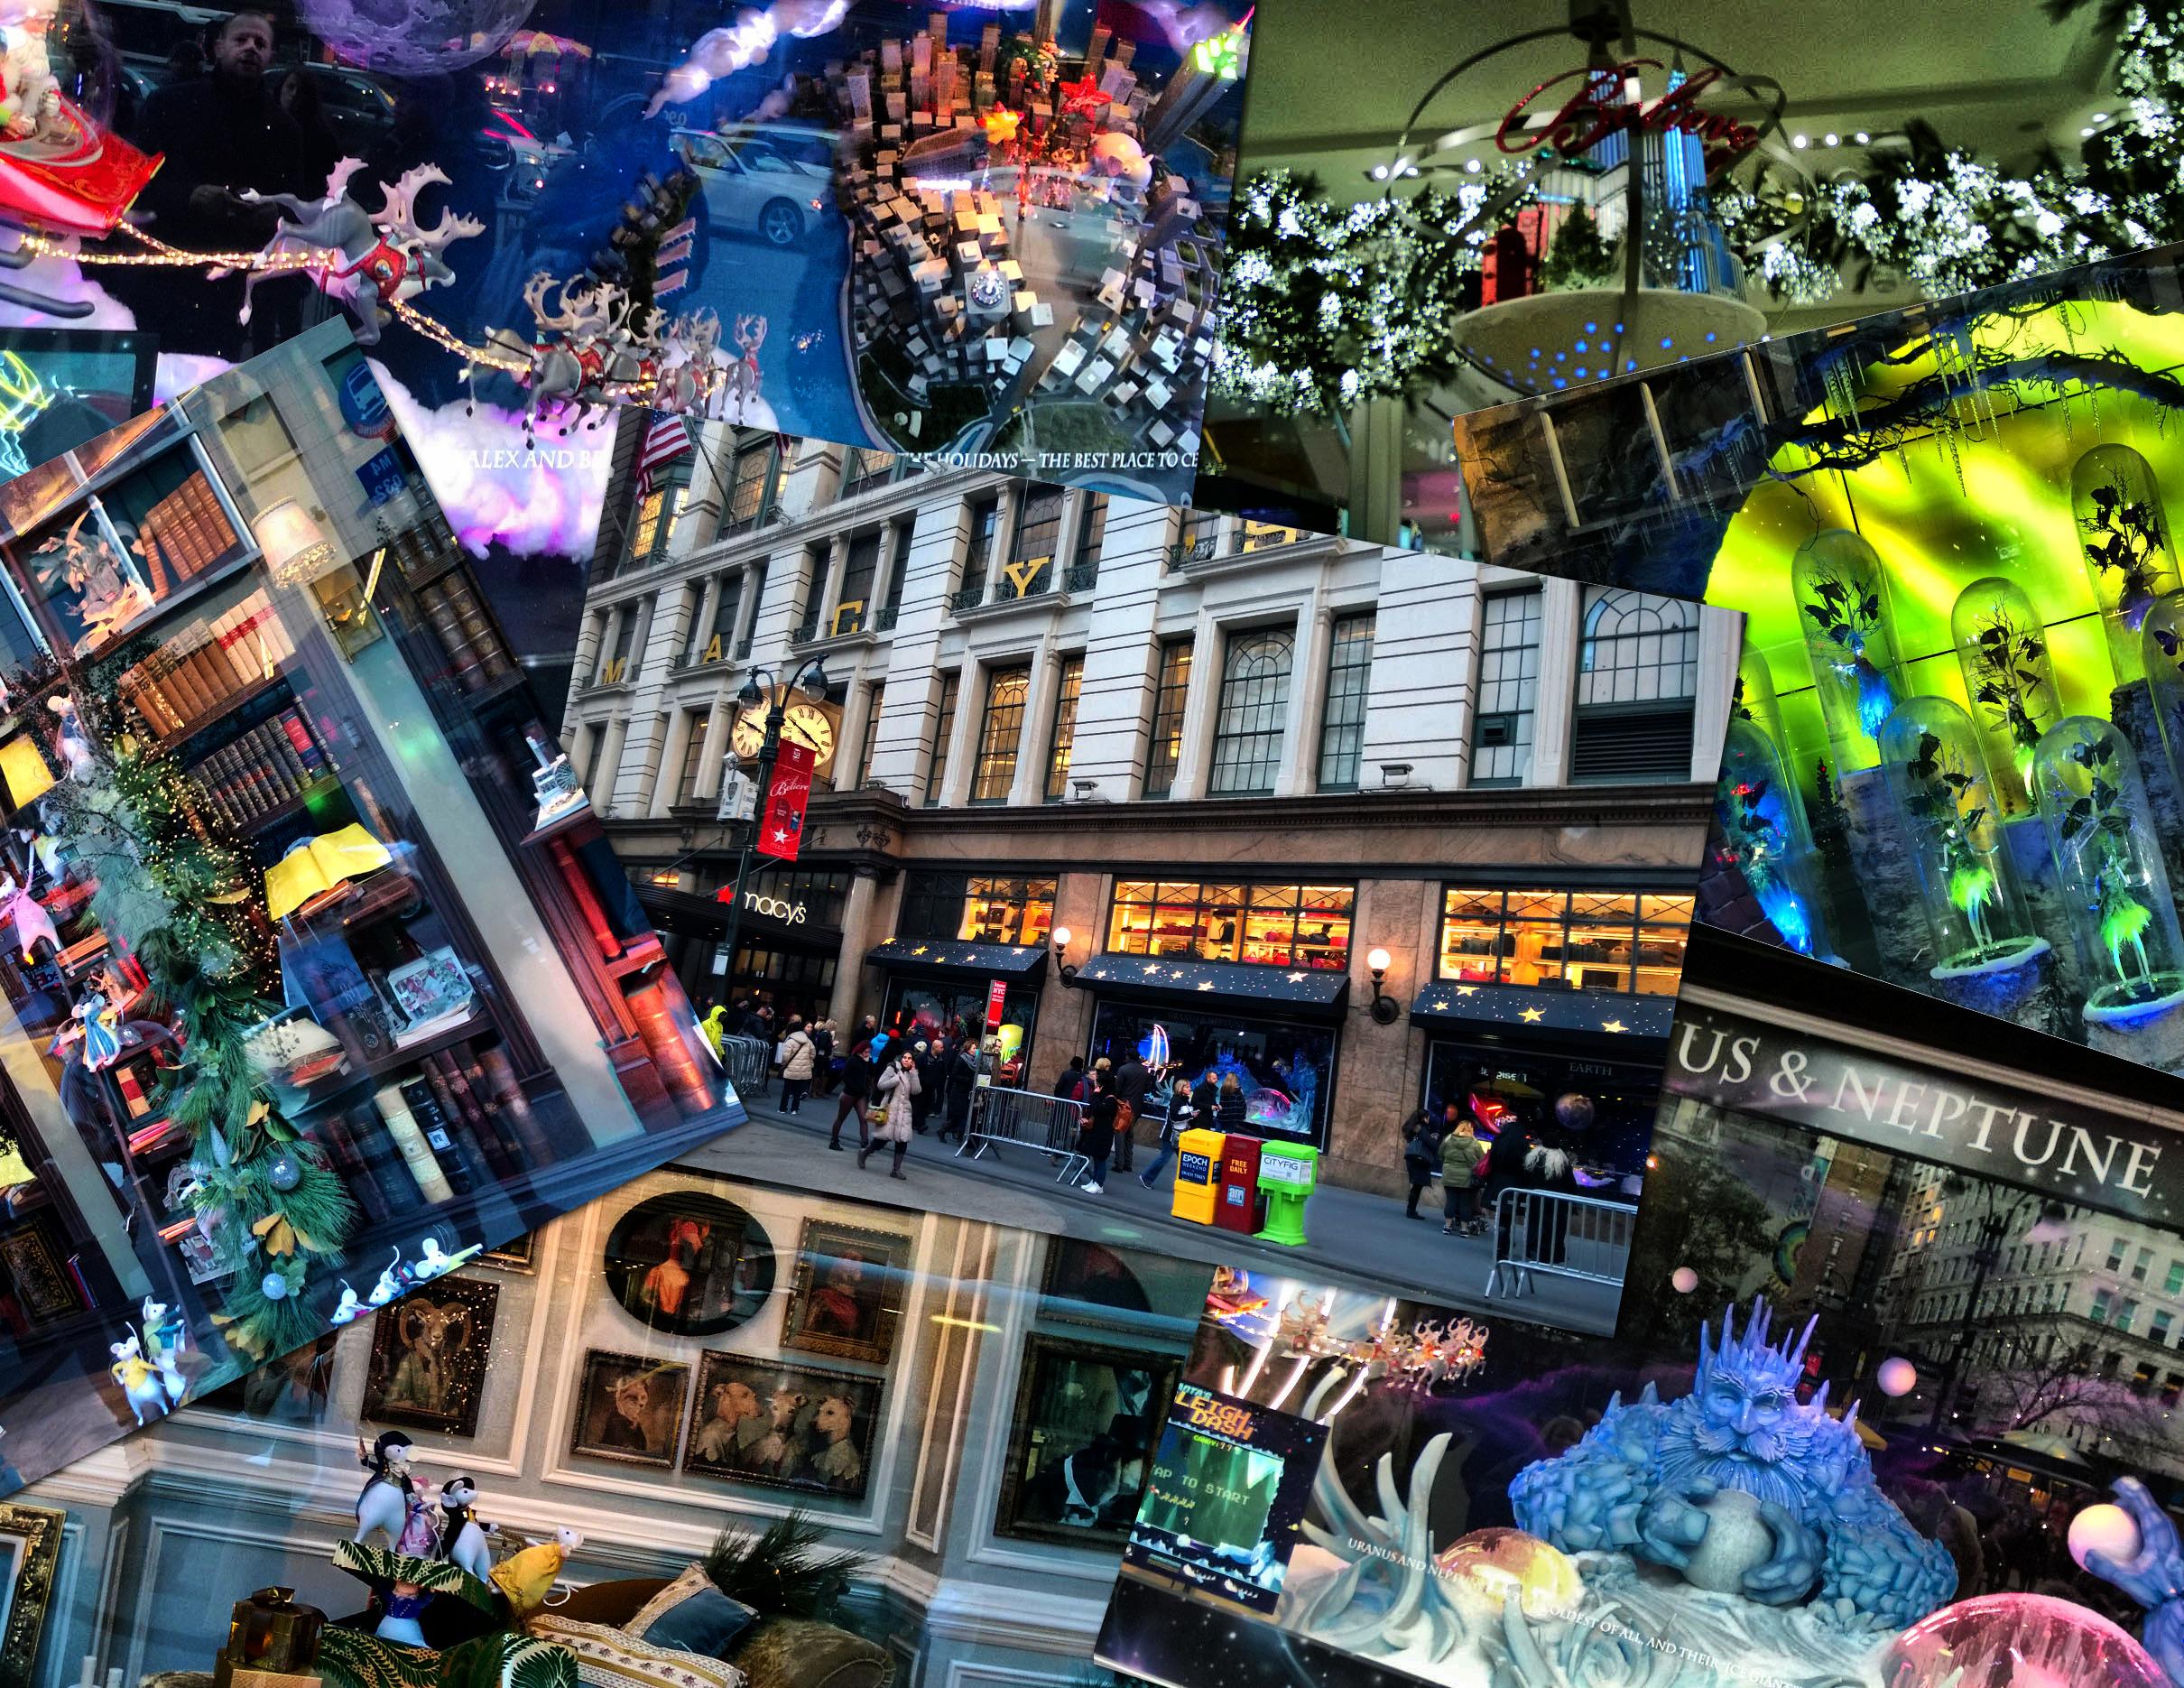 NYC Christmas Window Displays | Pursefixation.com